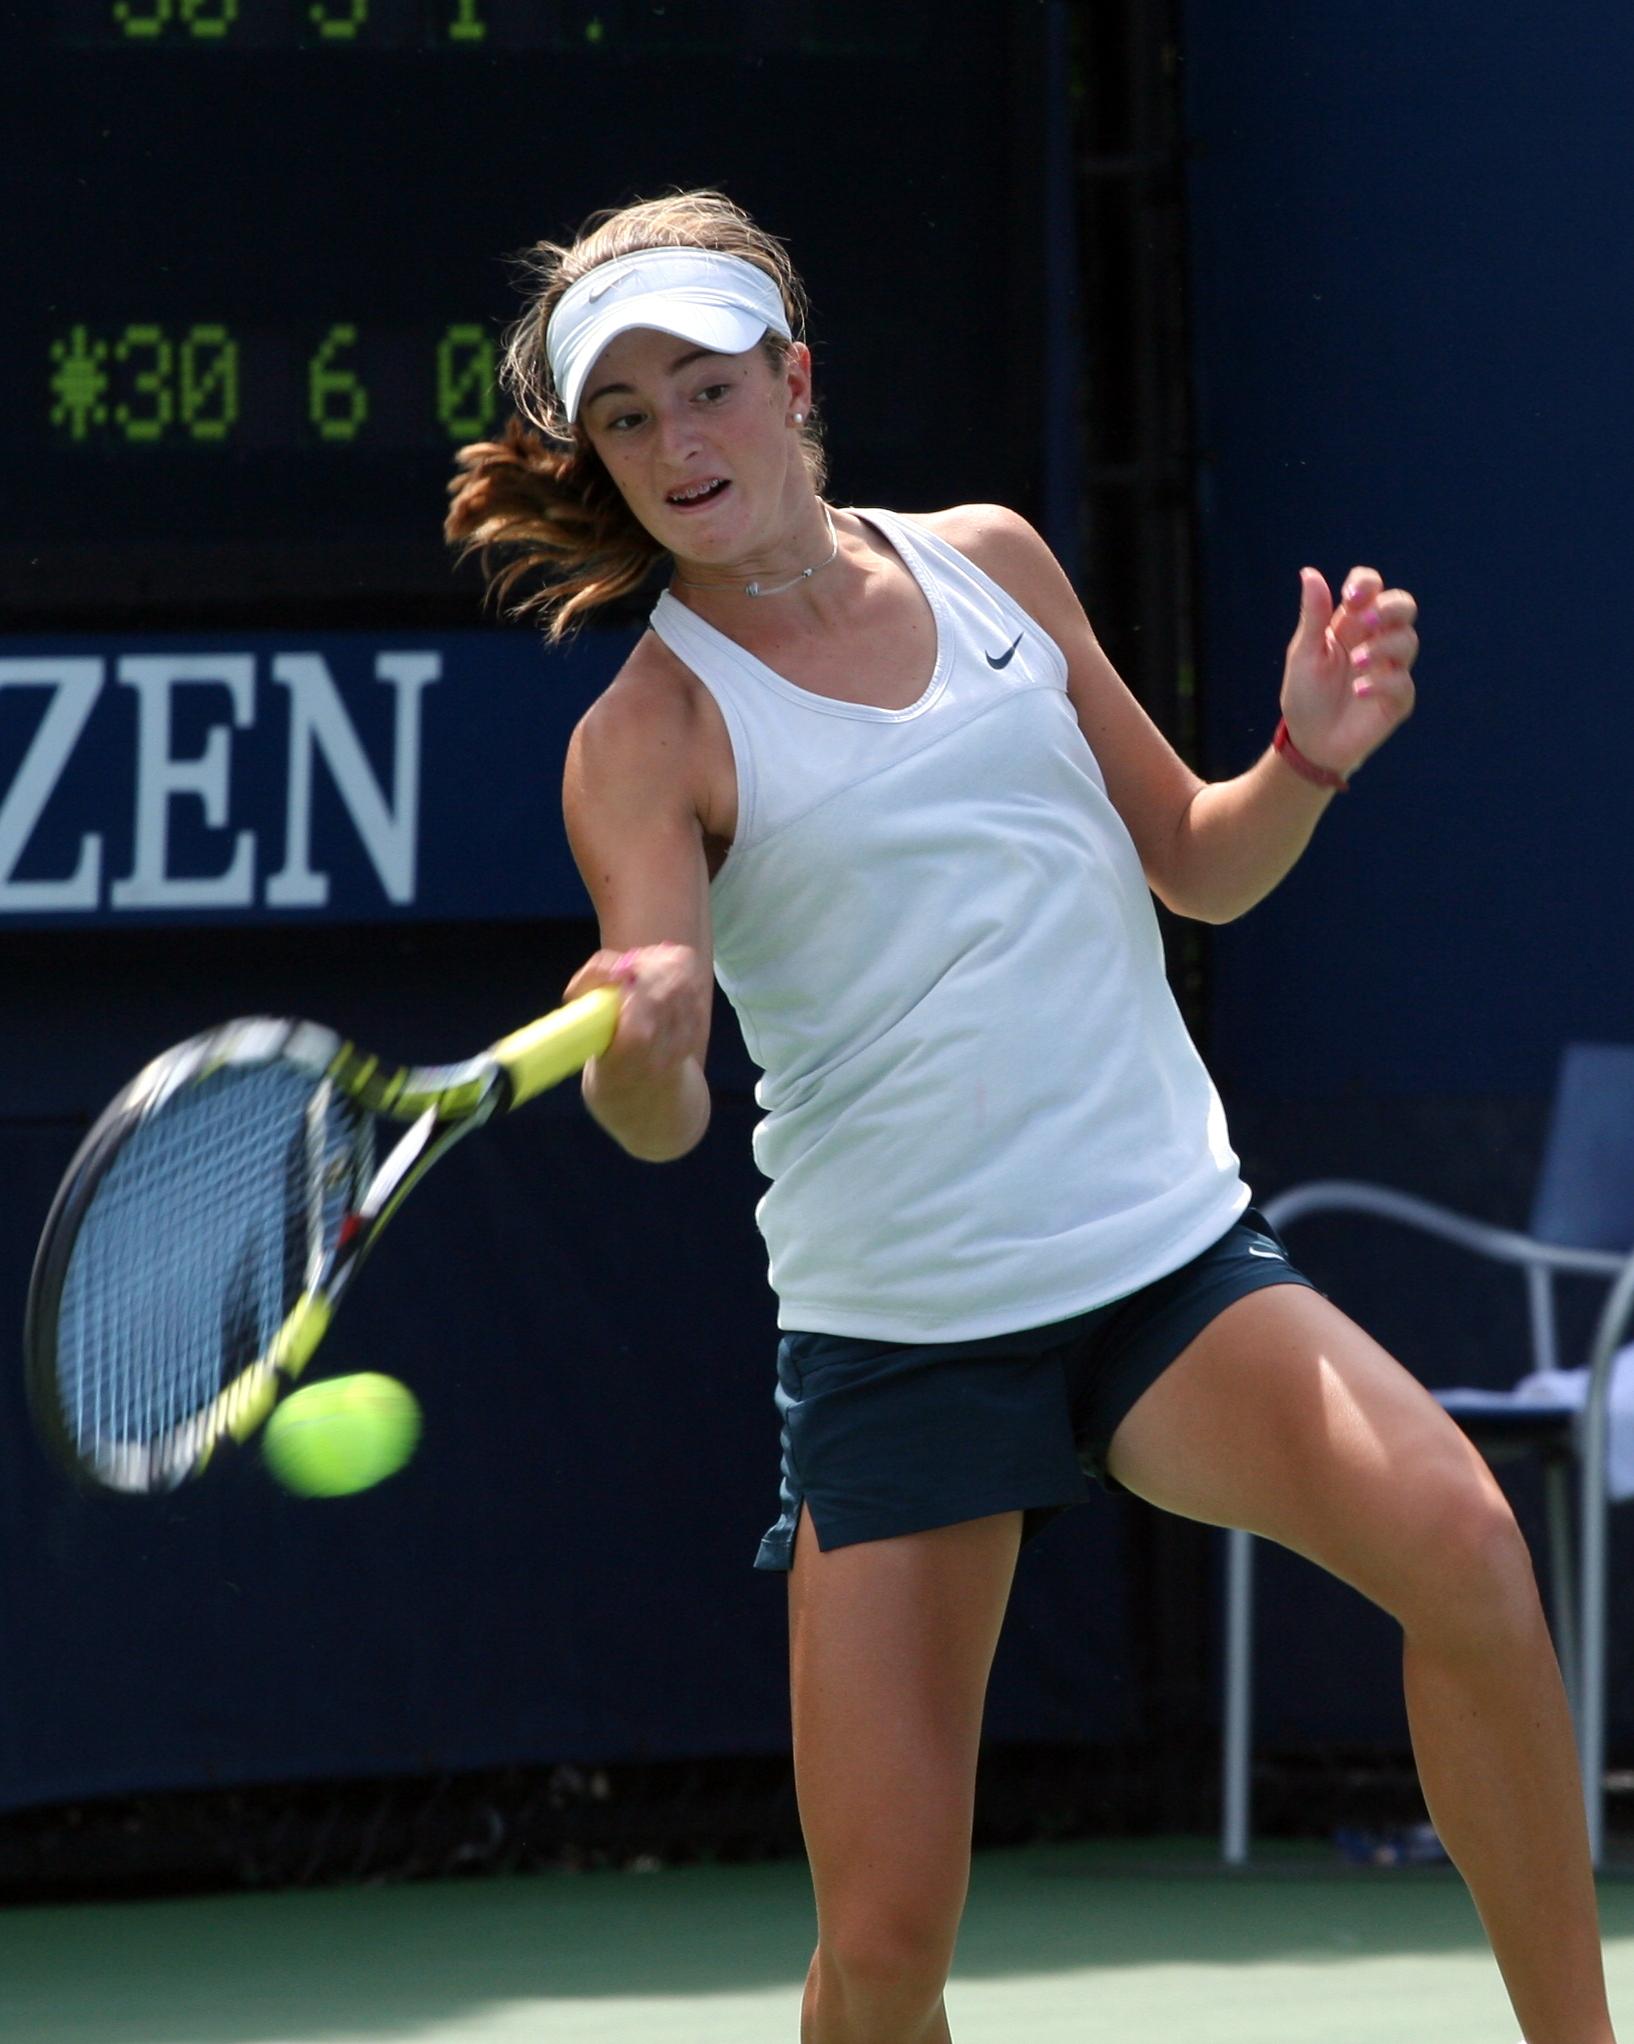 Bellis Tennis